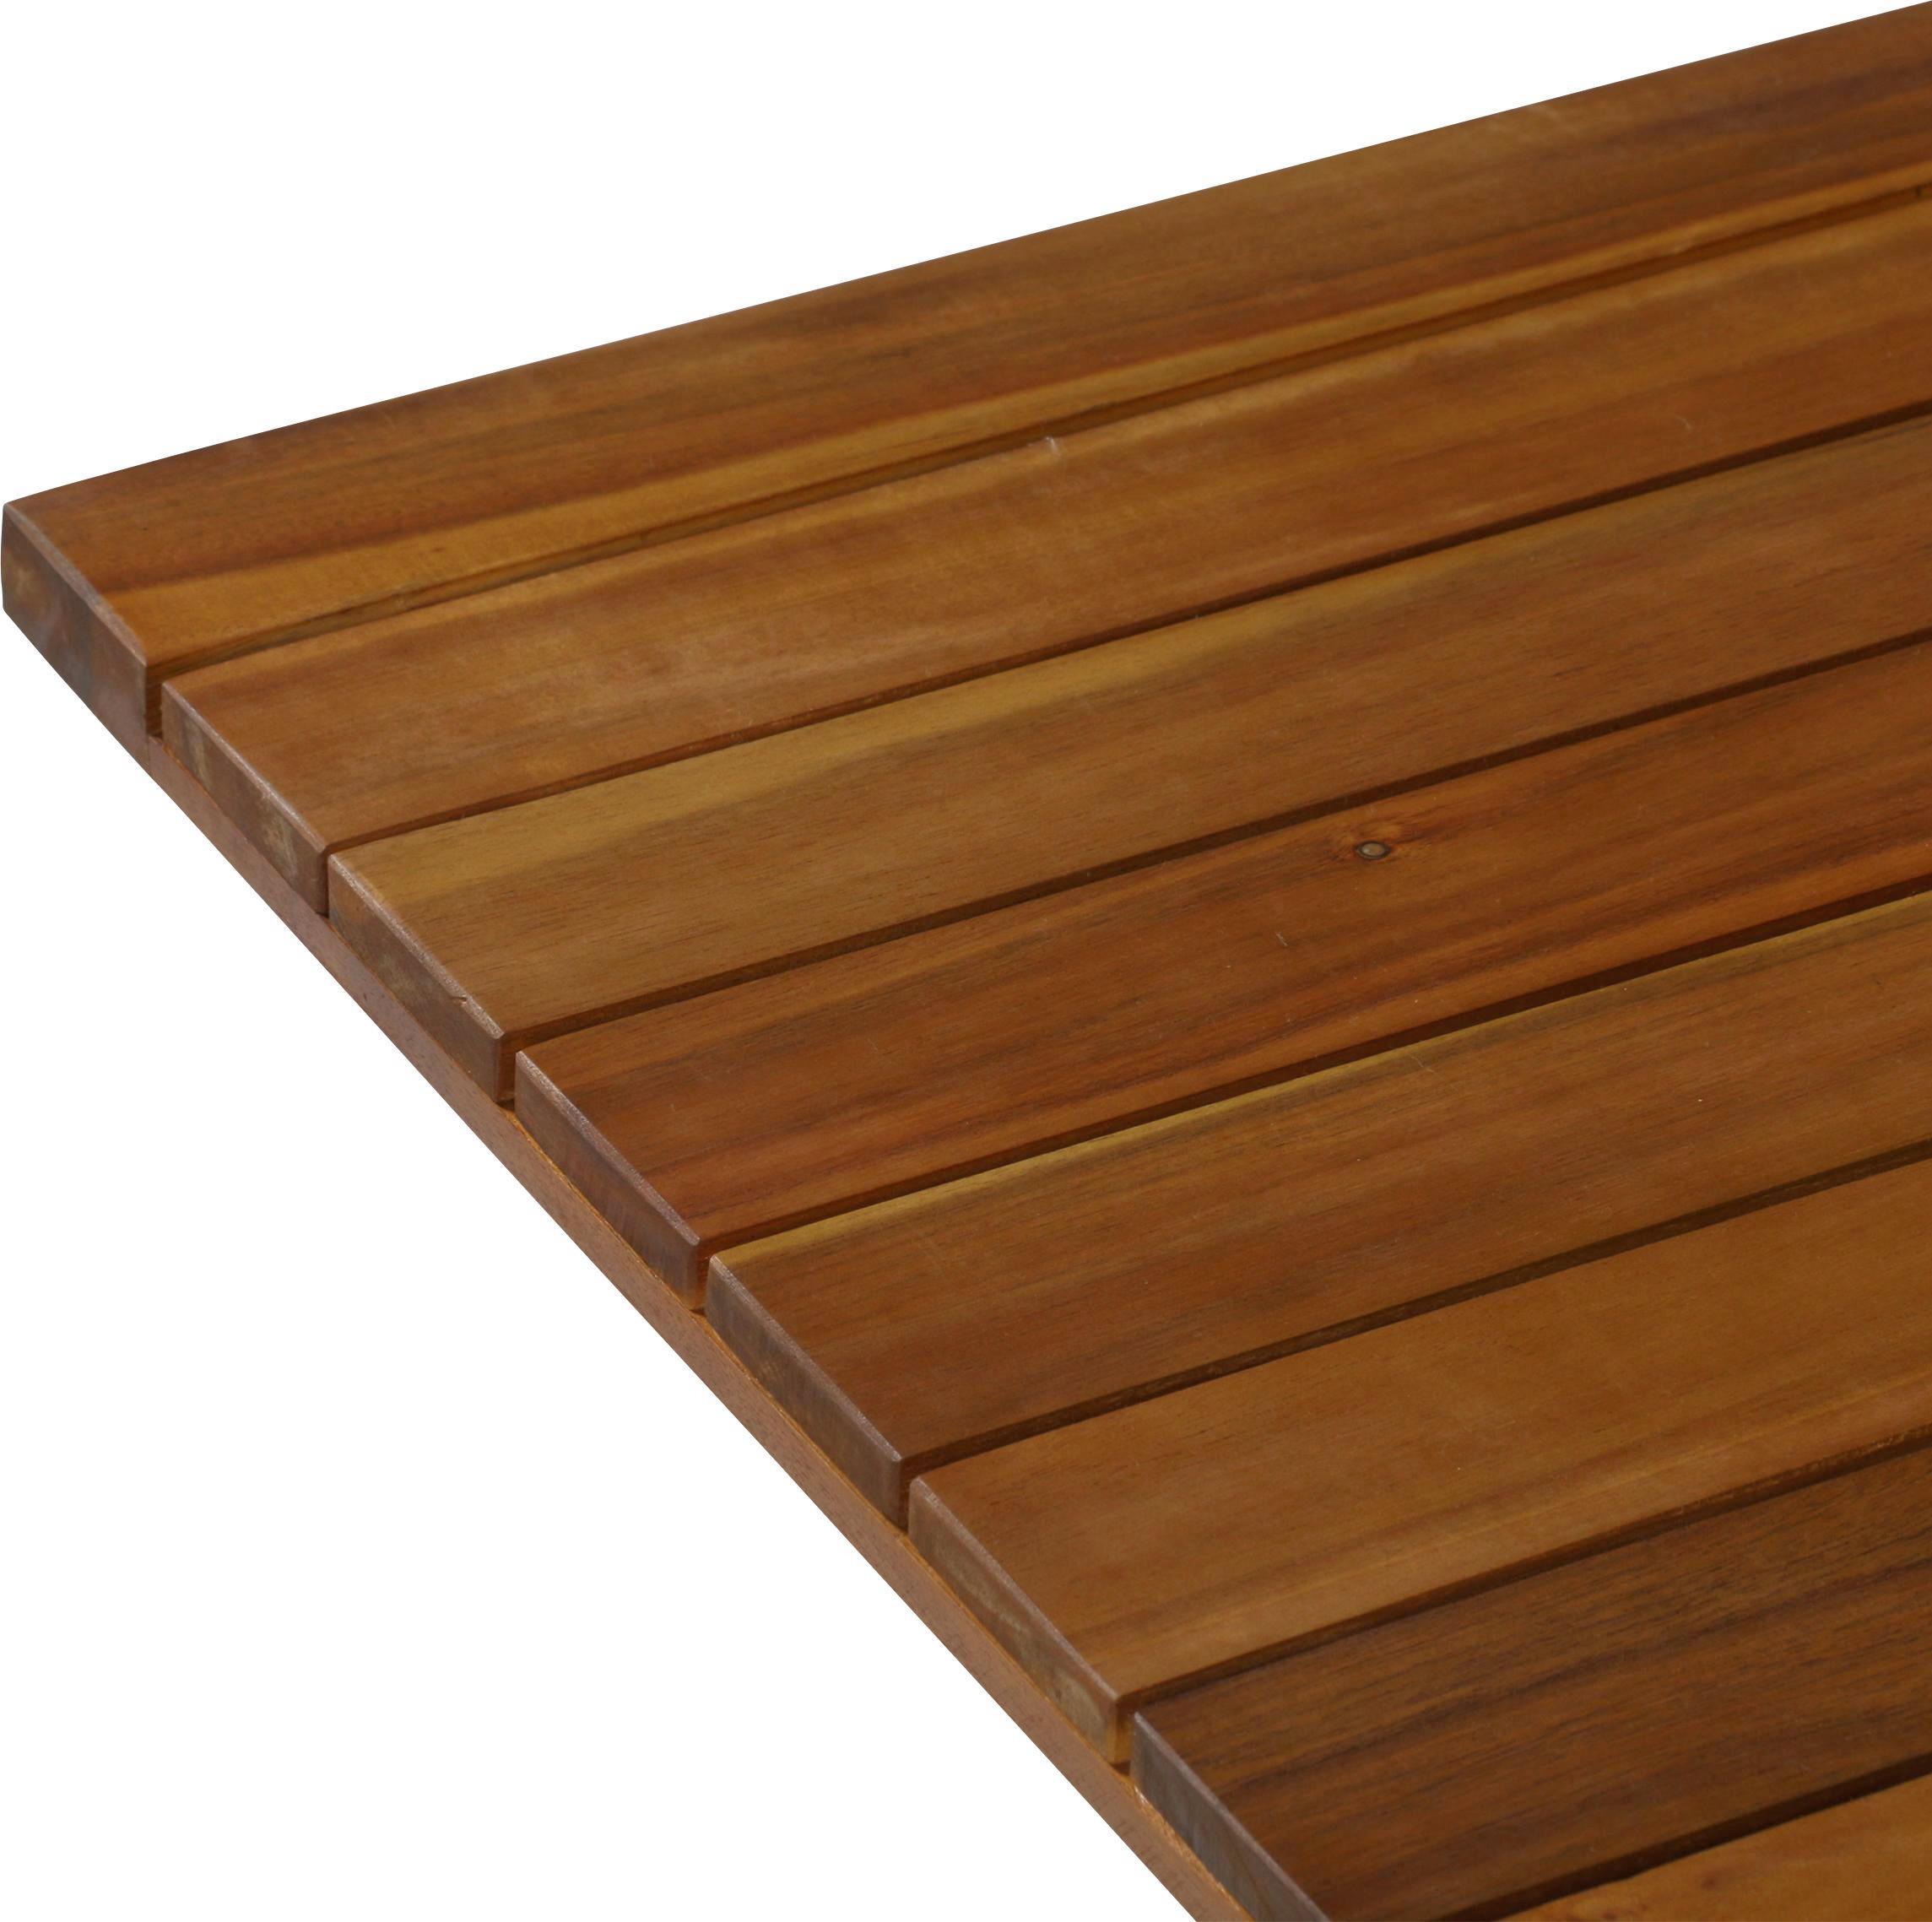 GARTENSET  7-teilig - Taupe/Naturfarben, Design, Holz/Kunststoff (150-200/77/96cm) - AMBIA GARDEN